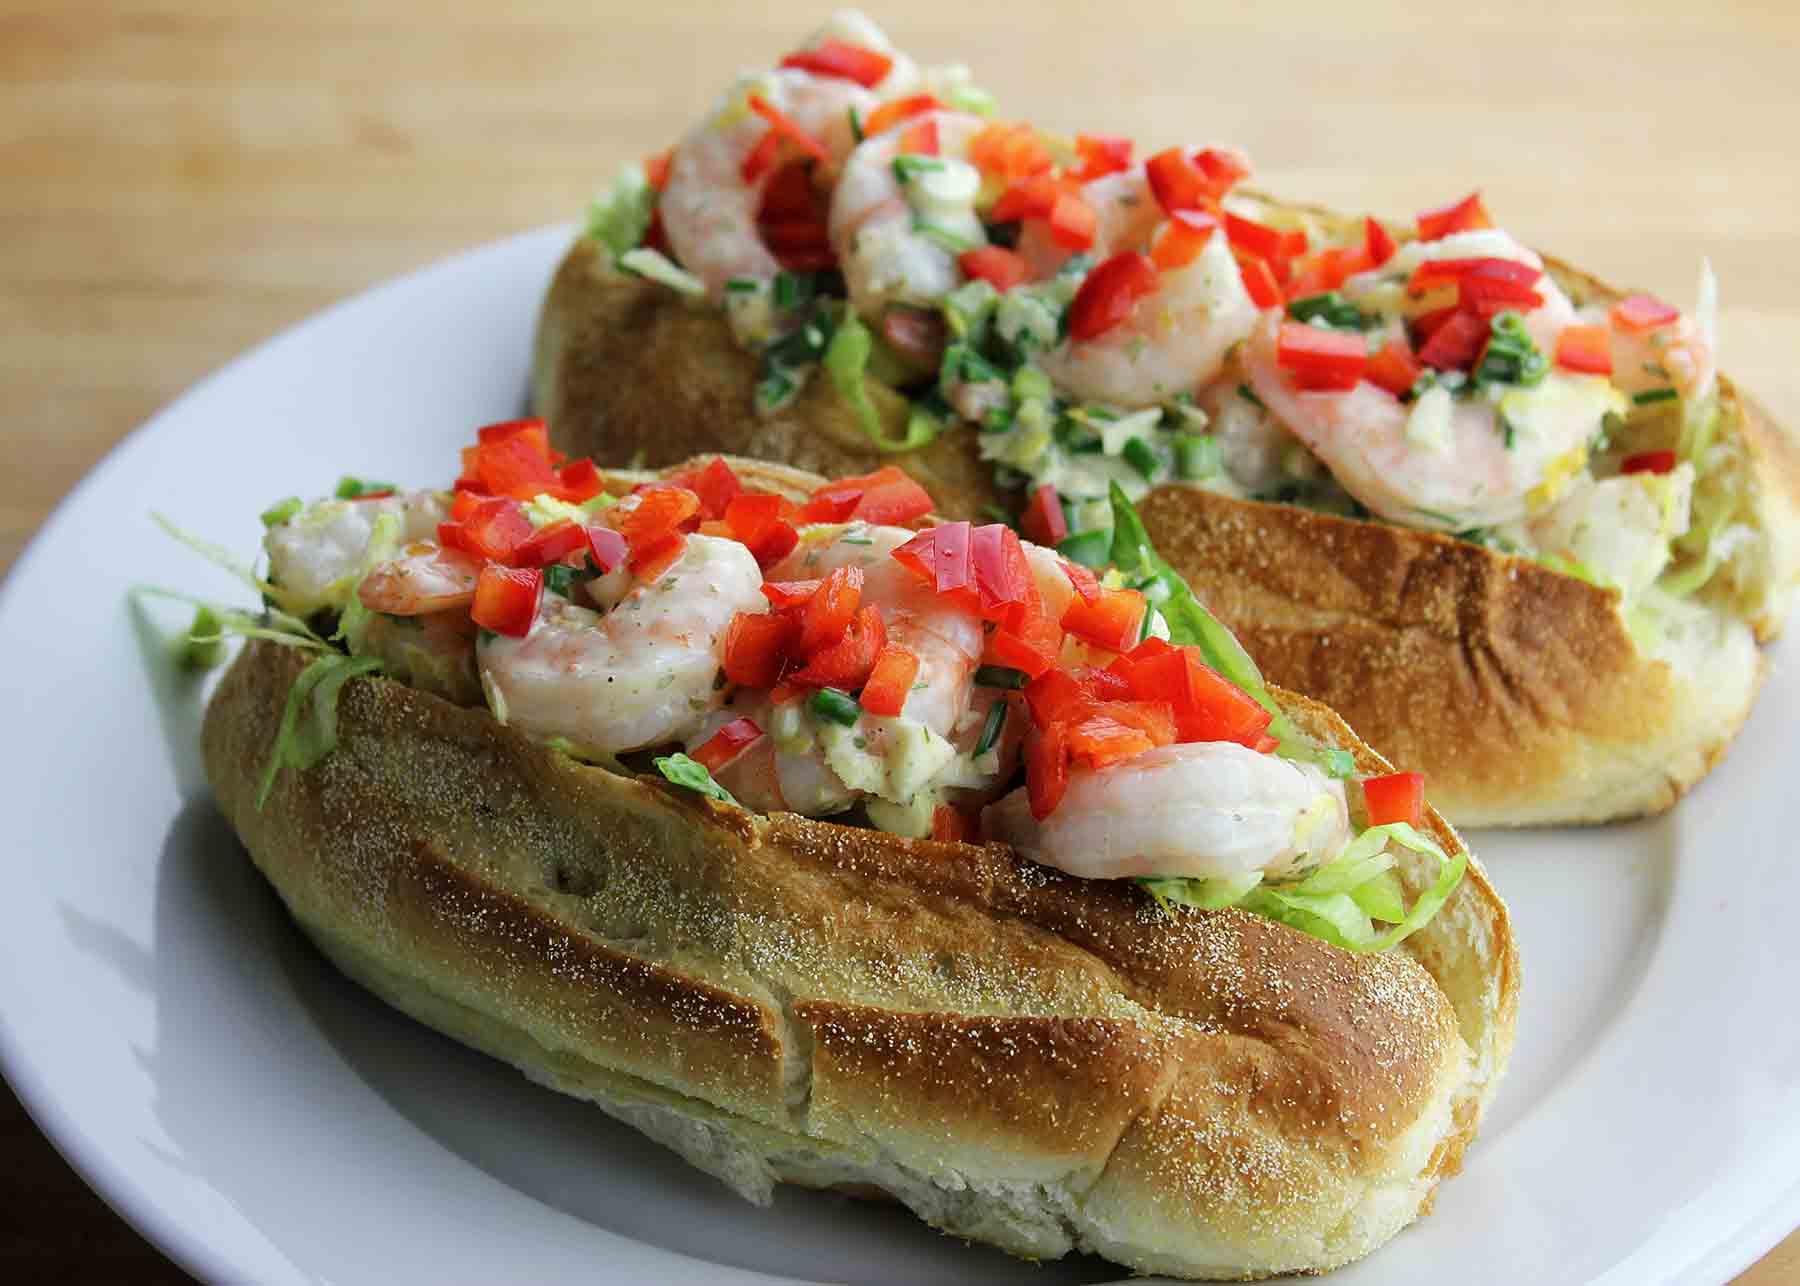 Shrimp roll sandwich